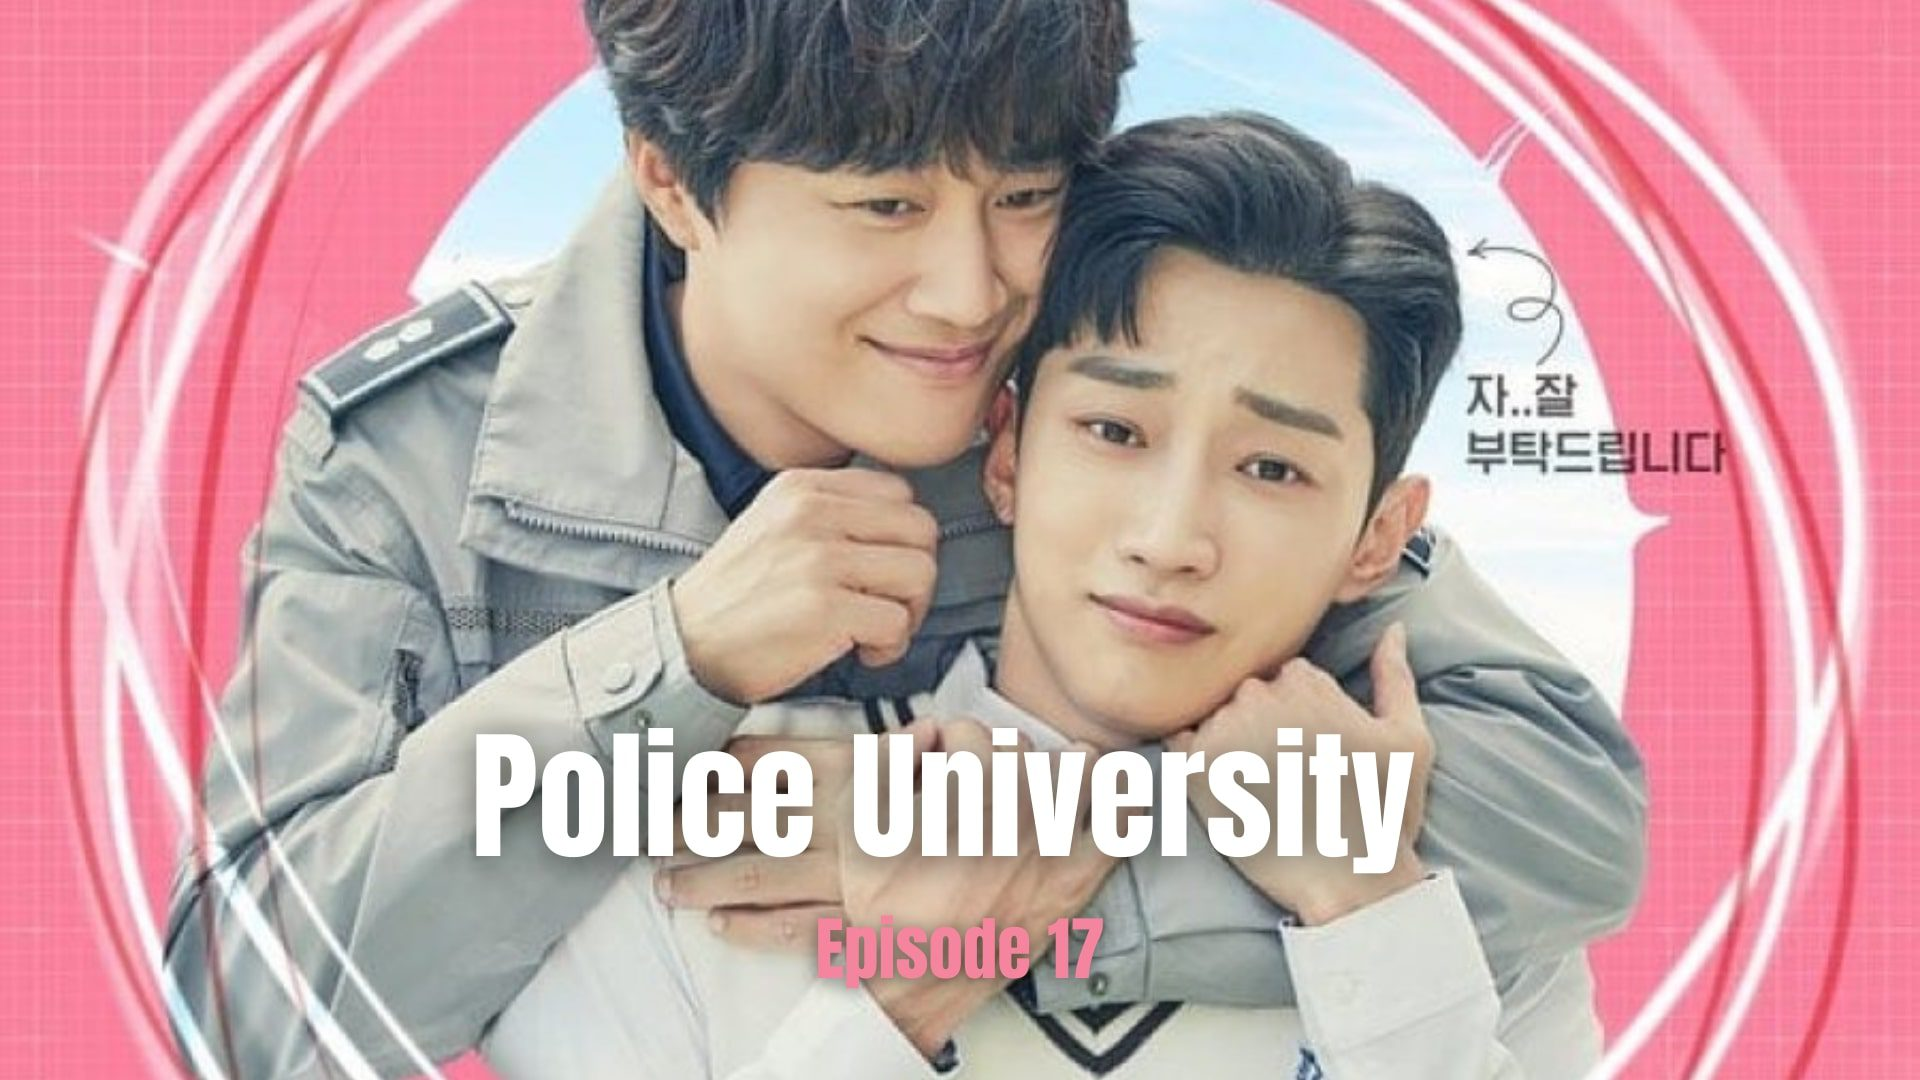 Police University Episode 17: Will It Have Season 2